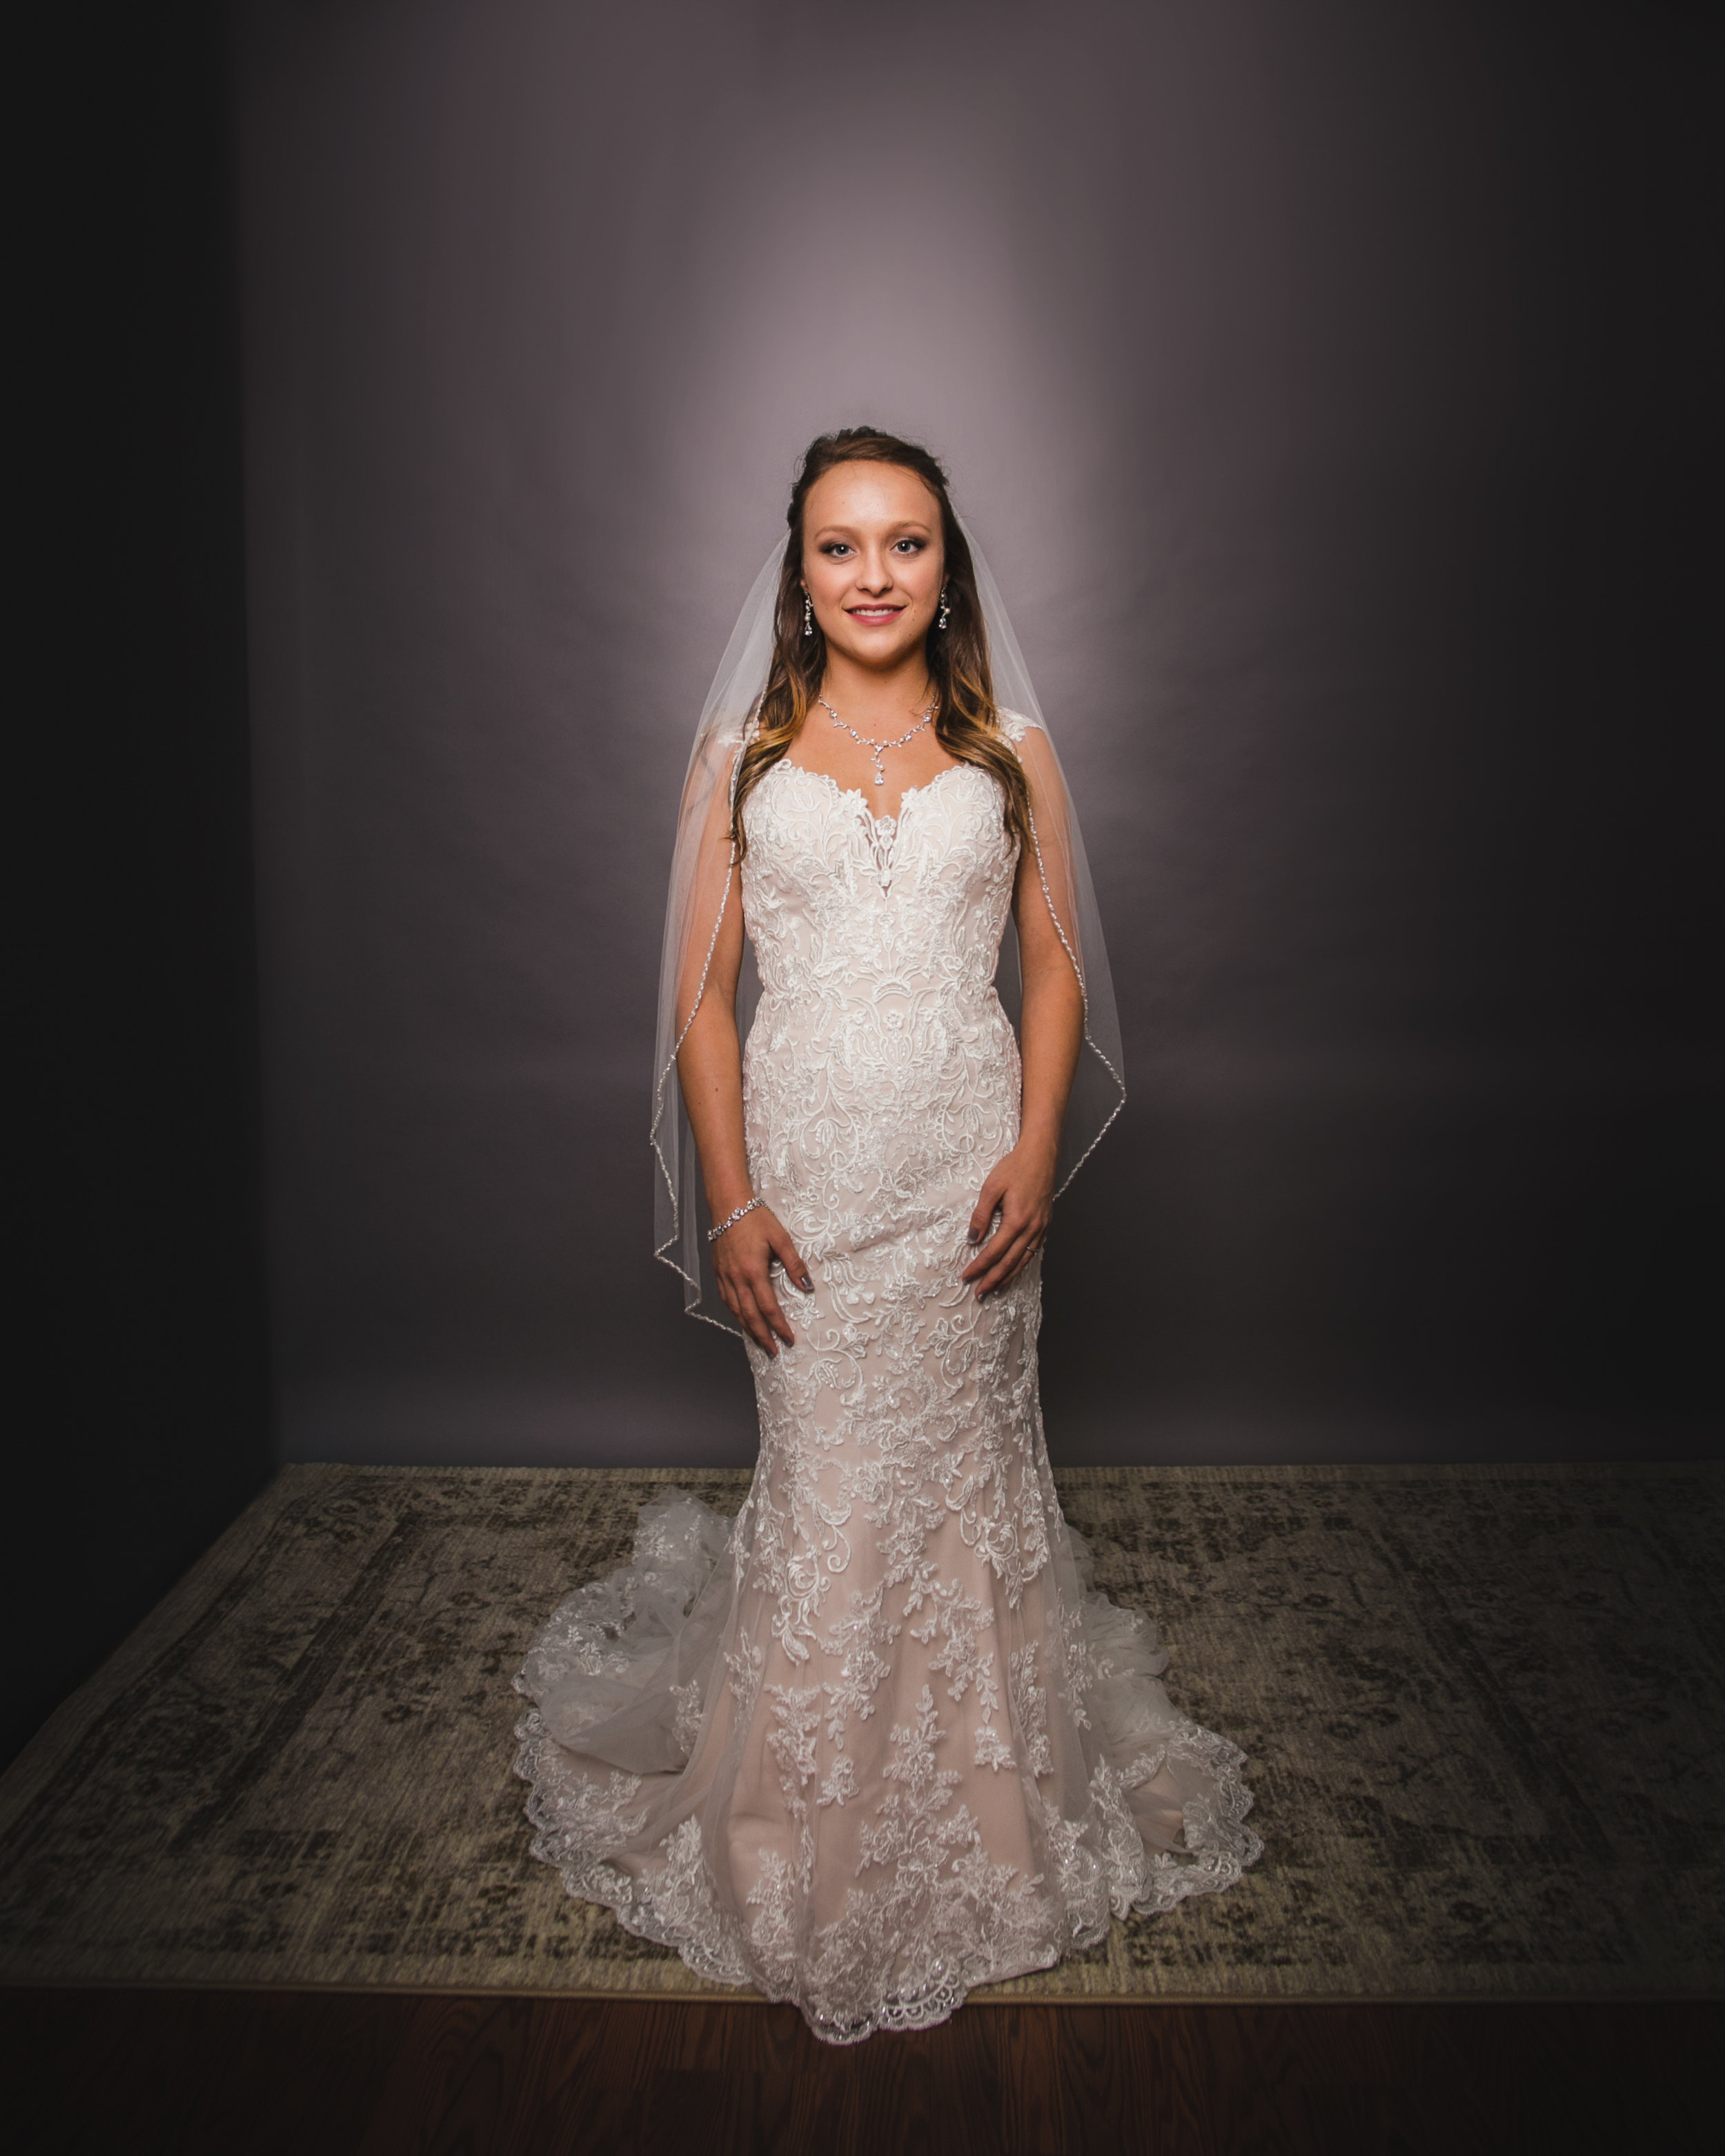 Nashville_Wedding_Photographers_DJ_Lighting_Bowling_Franklin (38 of 40).jpg